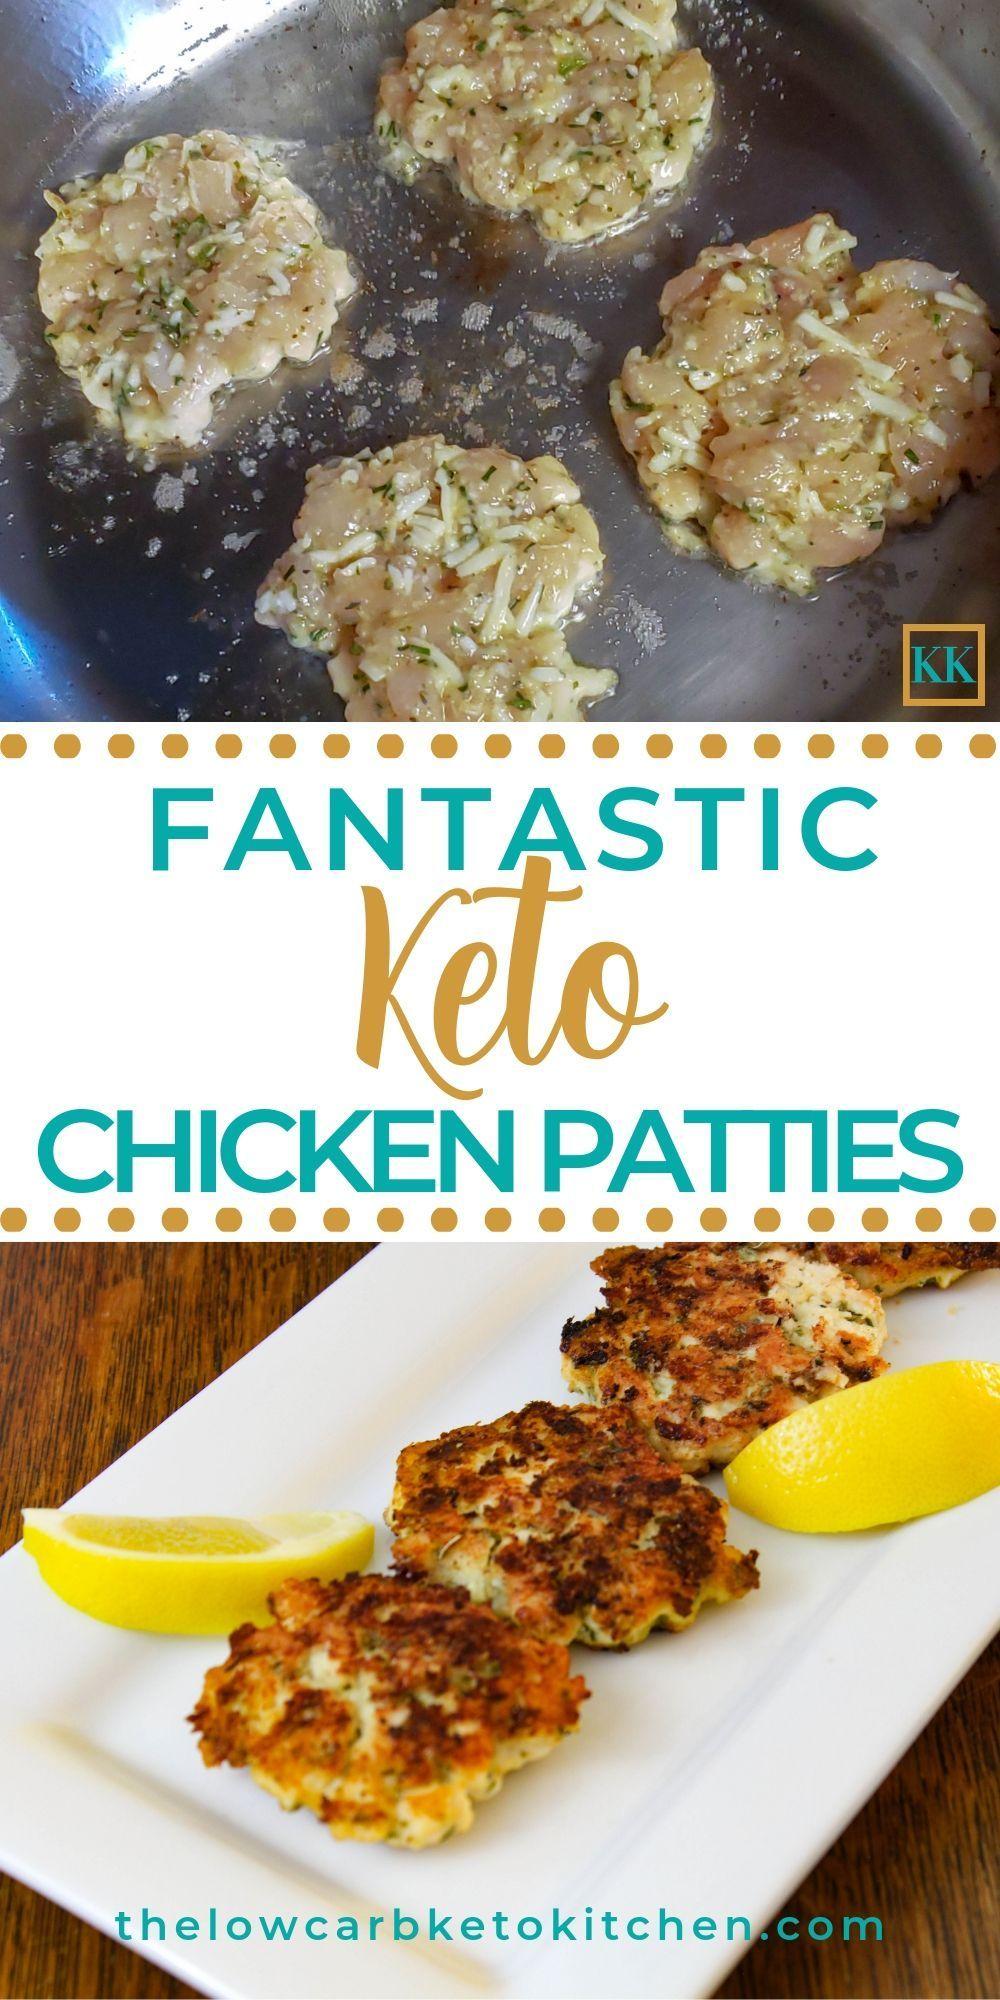 KETO CHEESY CHICKEN PATTIES